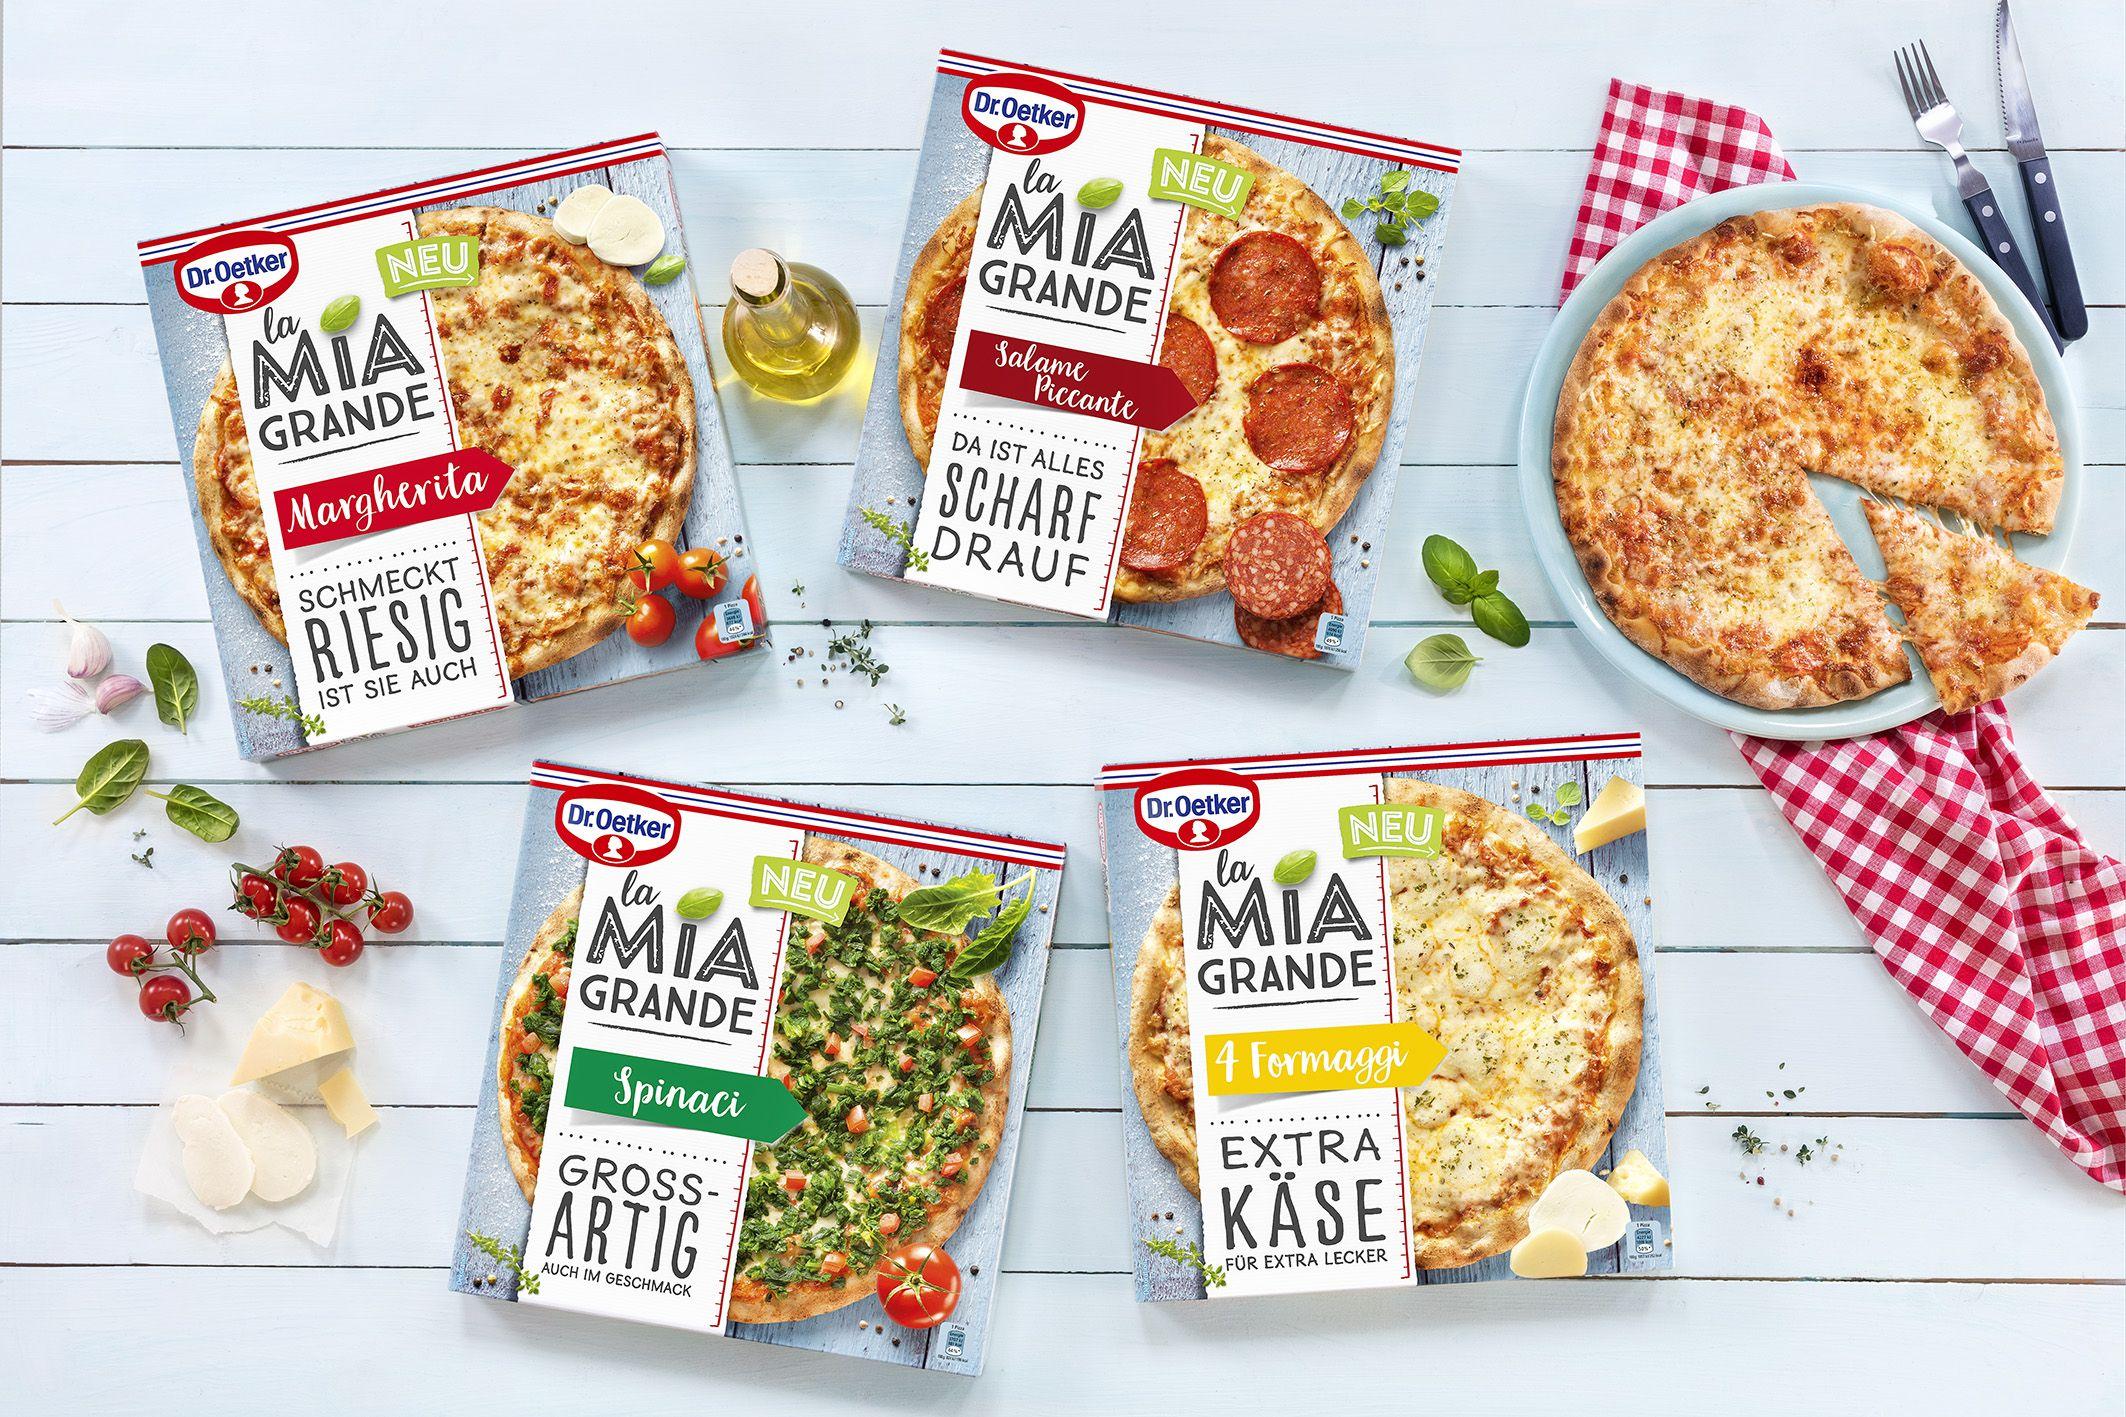 [Edeka Minden-Hannover (+Südwest)] Dr. Oetker La Mia Grande Pizza versch. Sorten mit Coupon für 2,29€(2,39€)